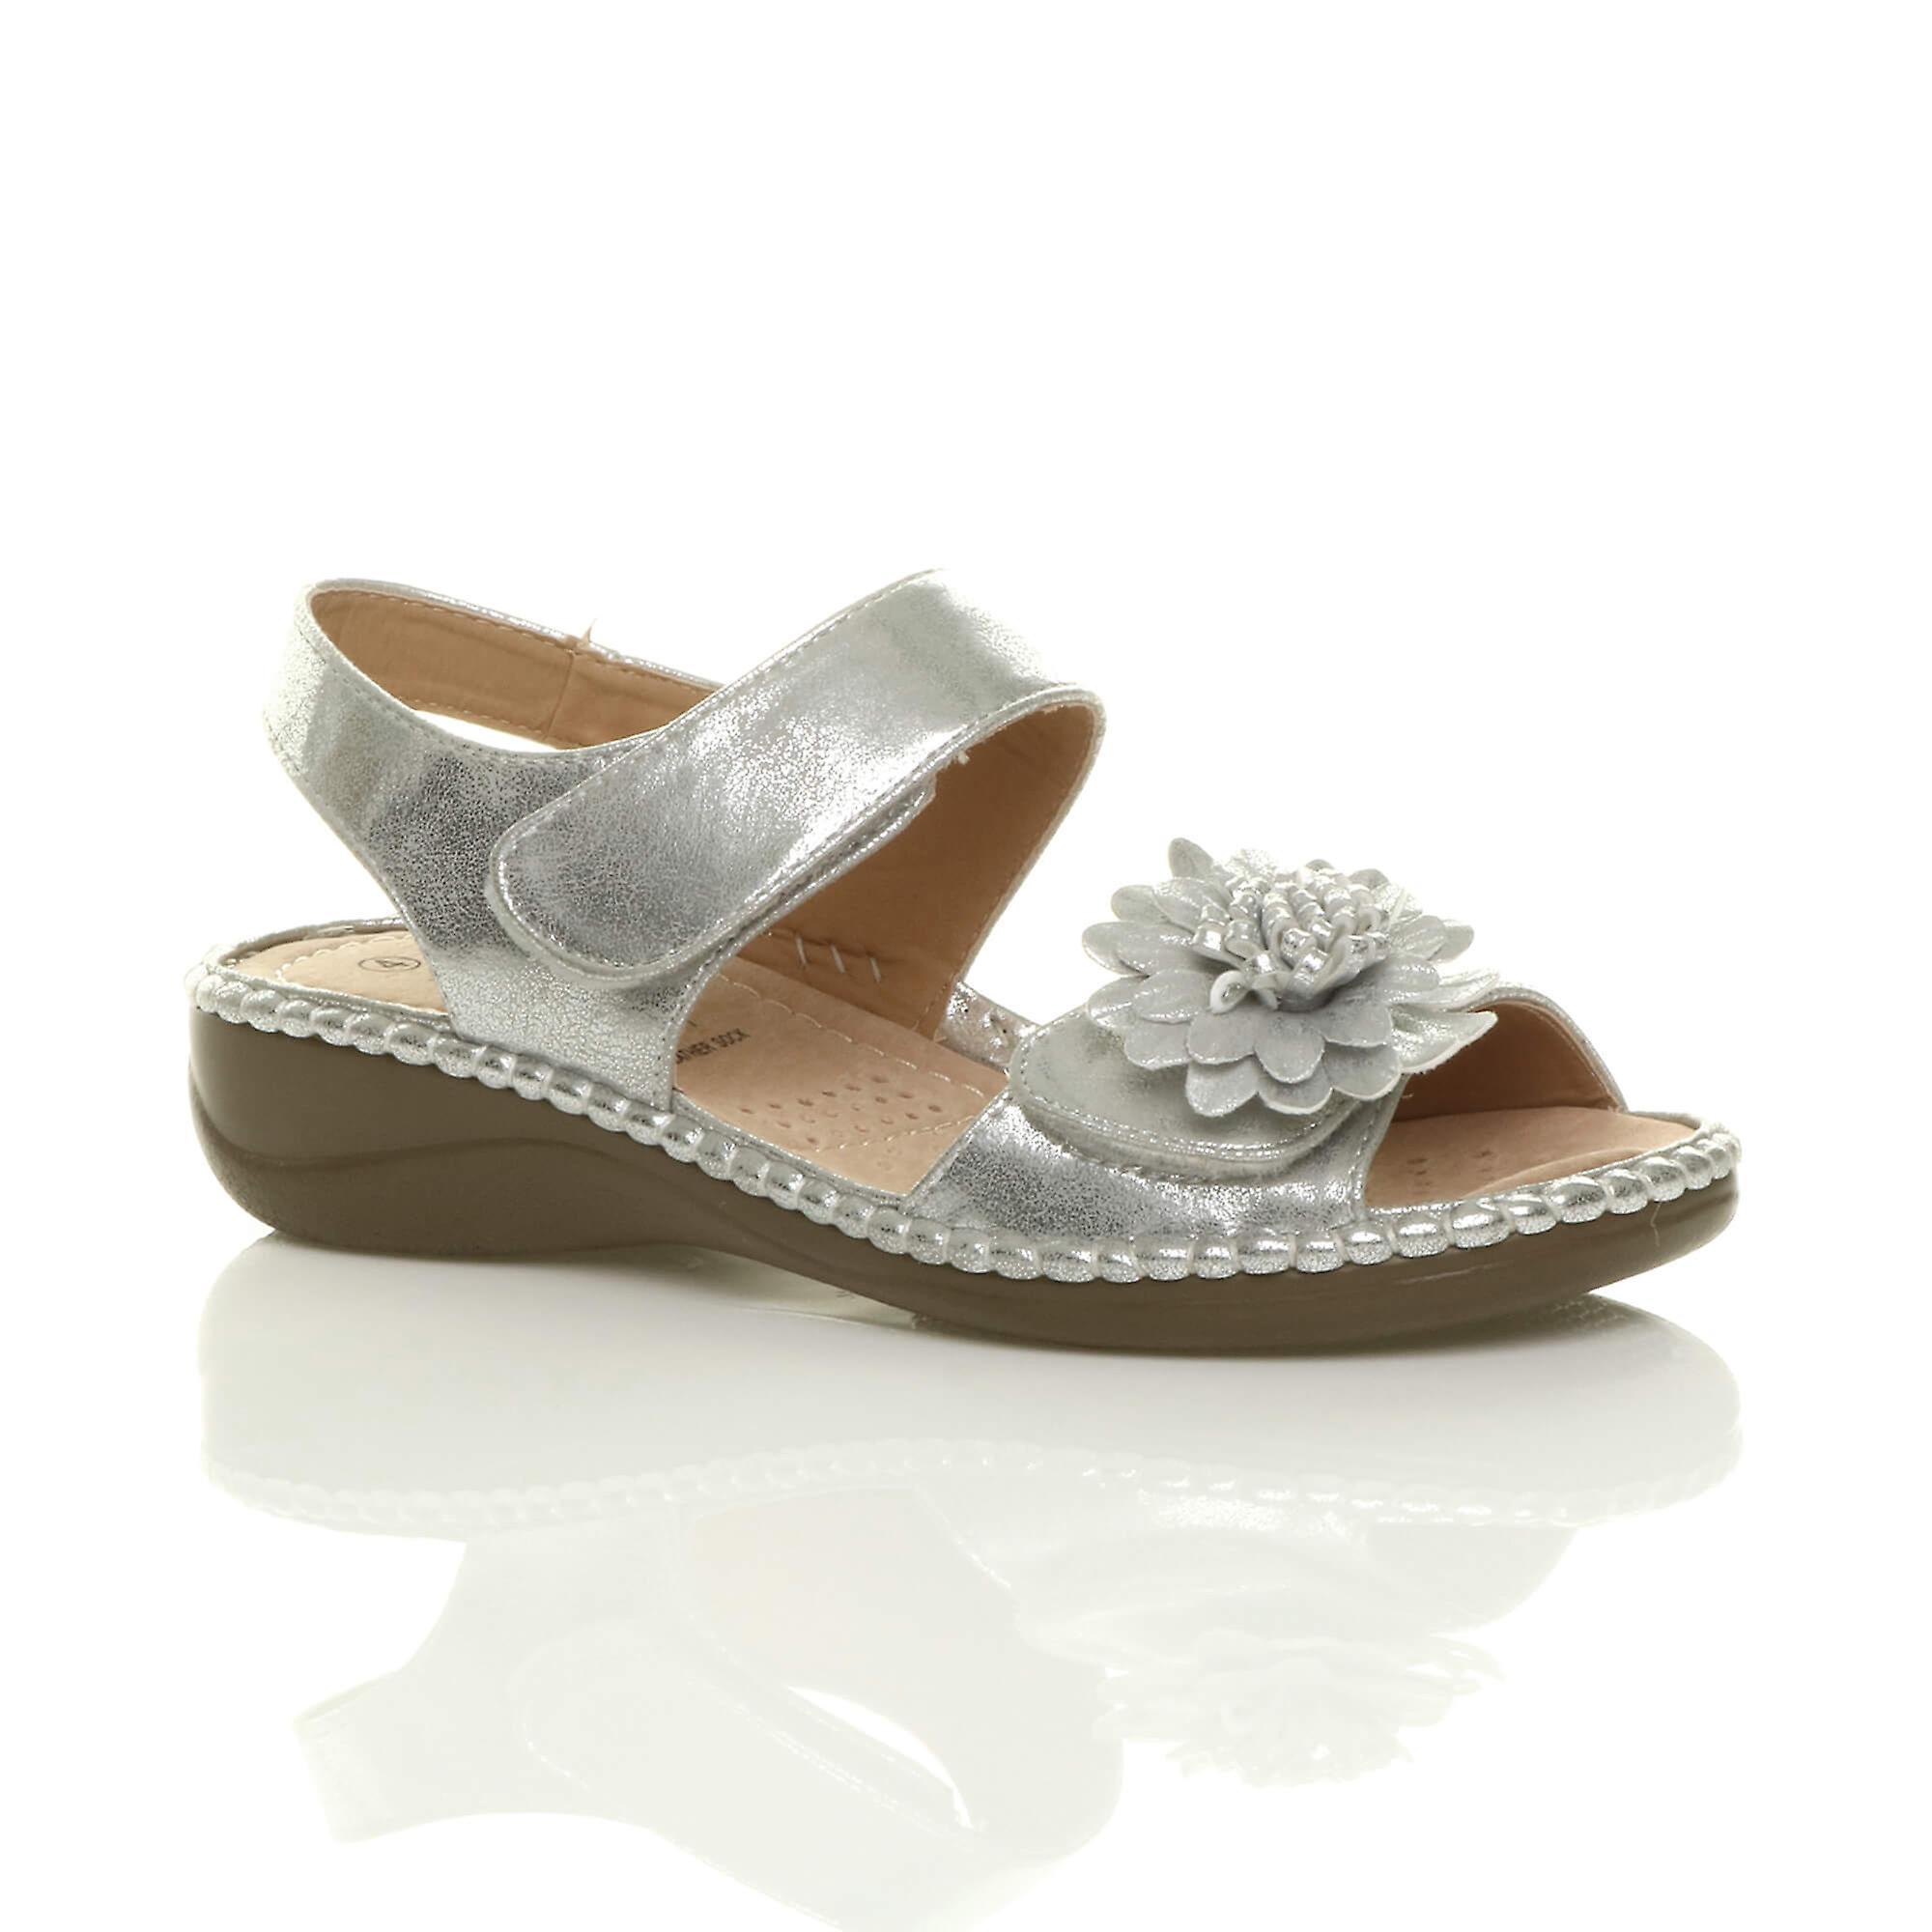 Ajvani womens low wedge heel hook & loop strap slingback flower comfort leather insole sandals shoes uiauo